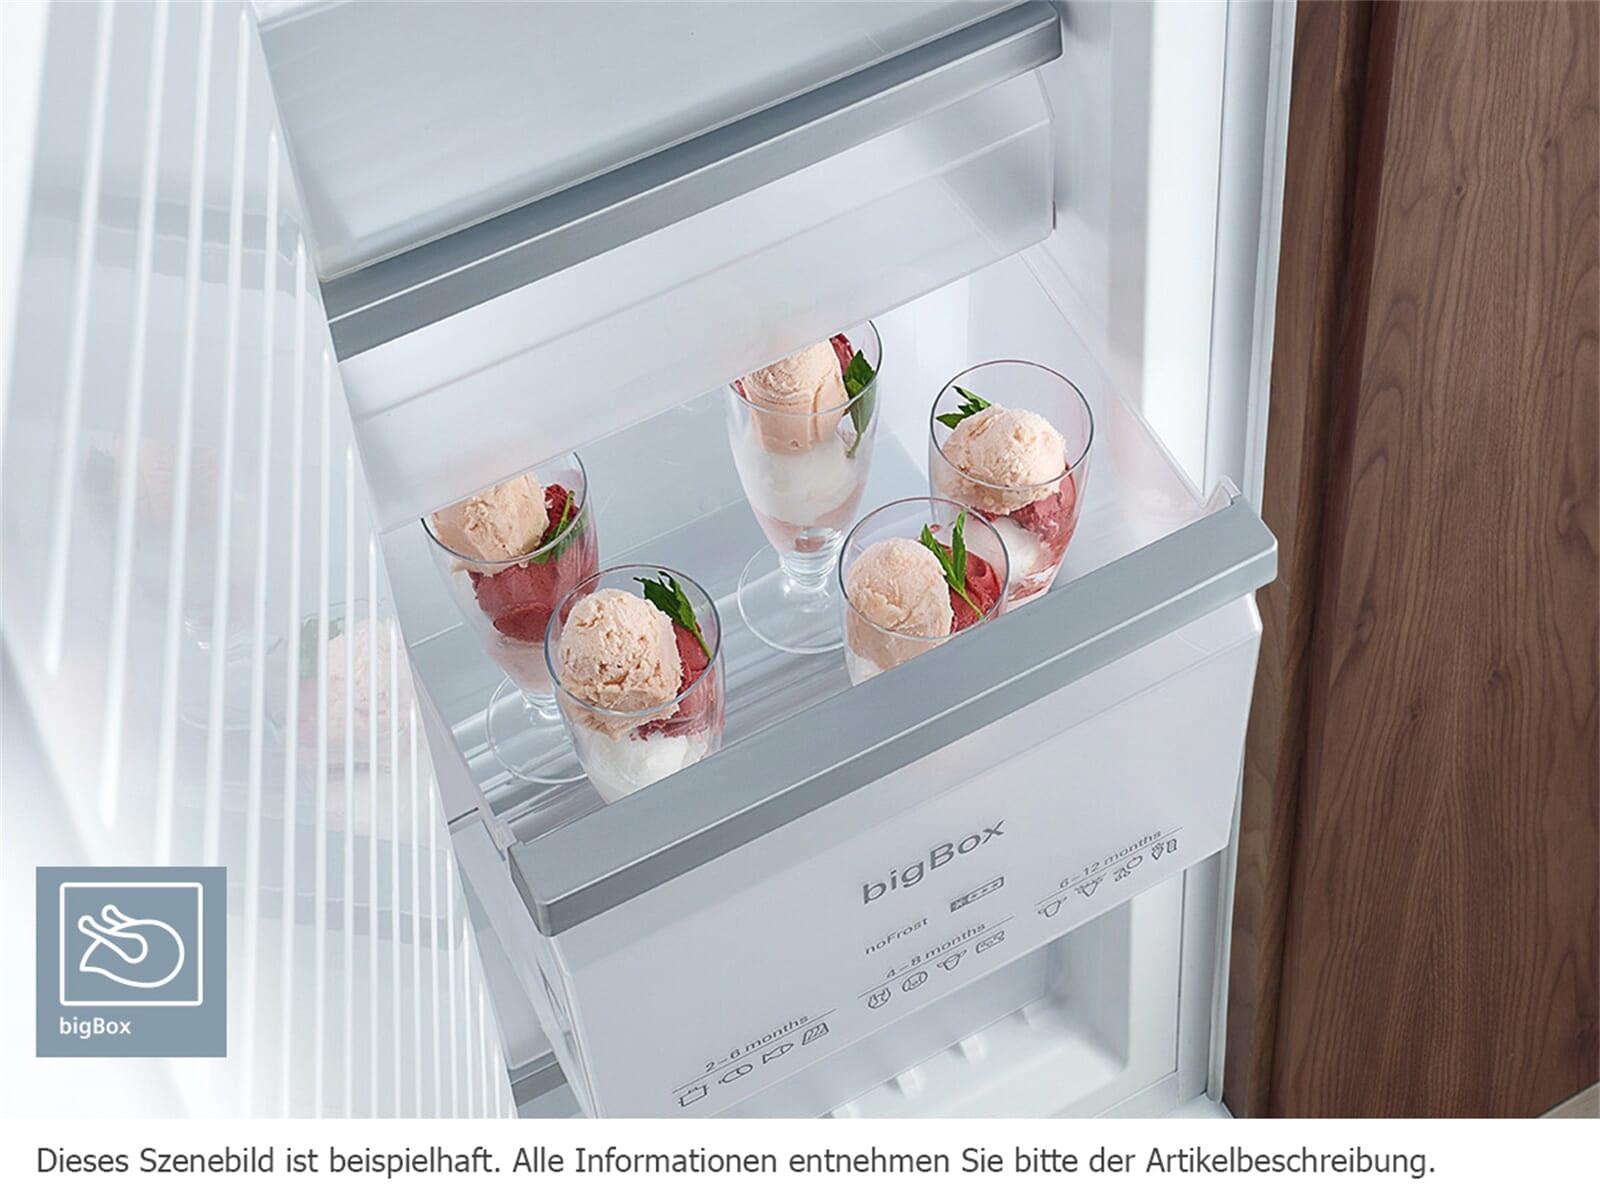 Siemens Kühlschrank Fehler E4 : Kühlschrank otto ward mary